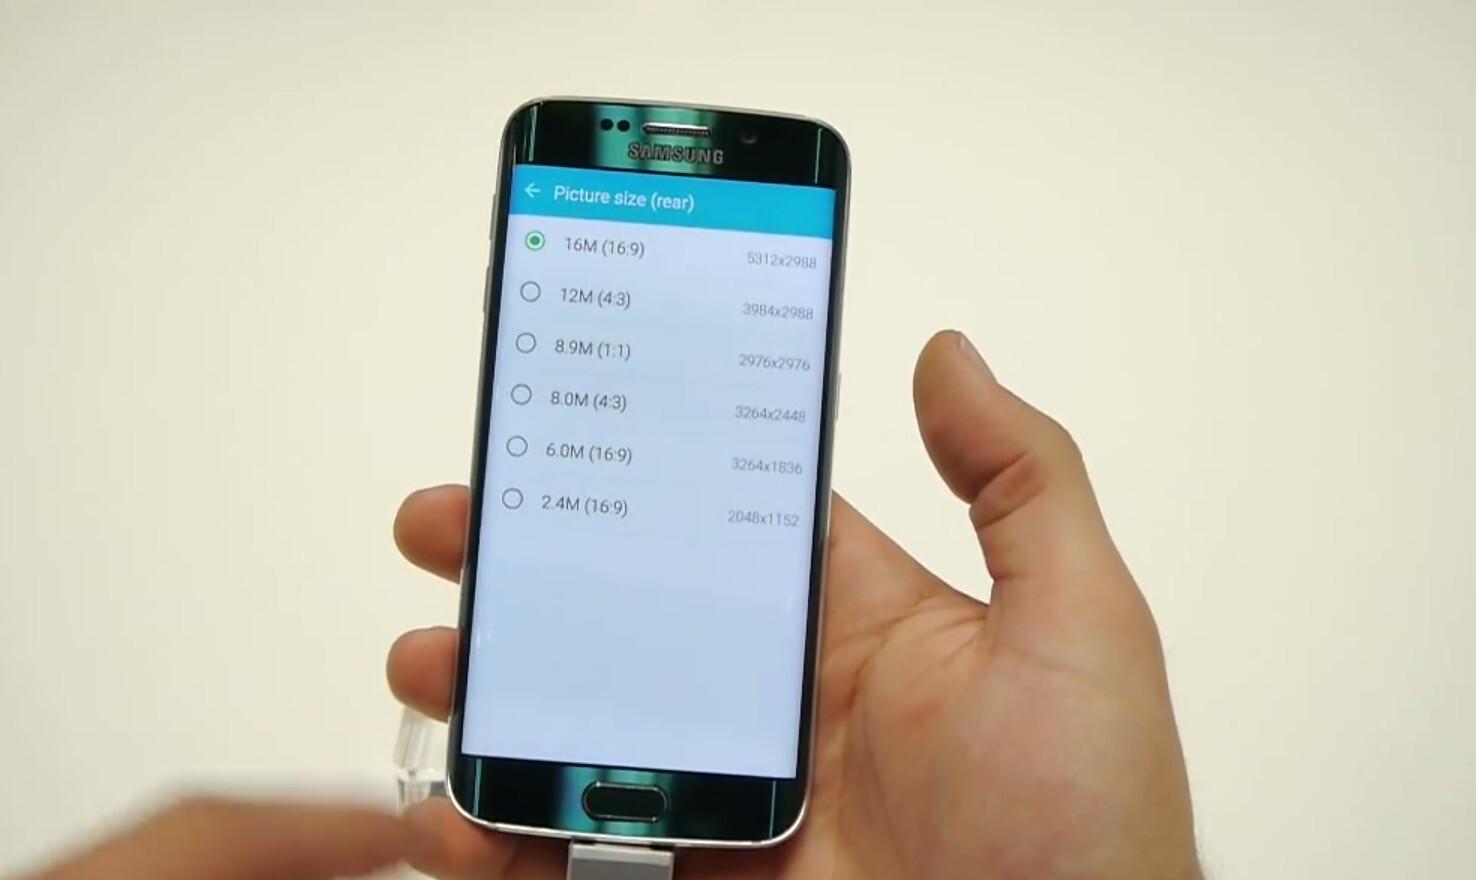 how to unpause walk icon on samsung phone